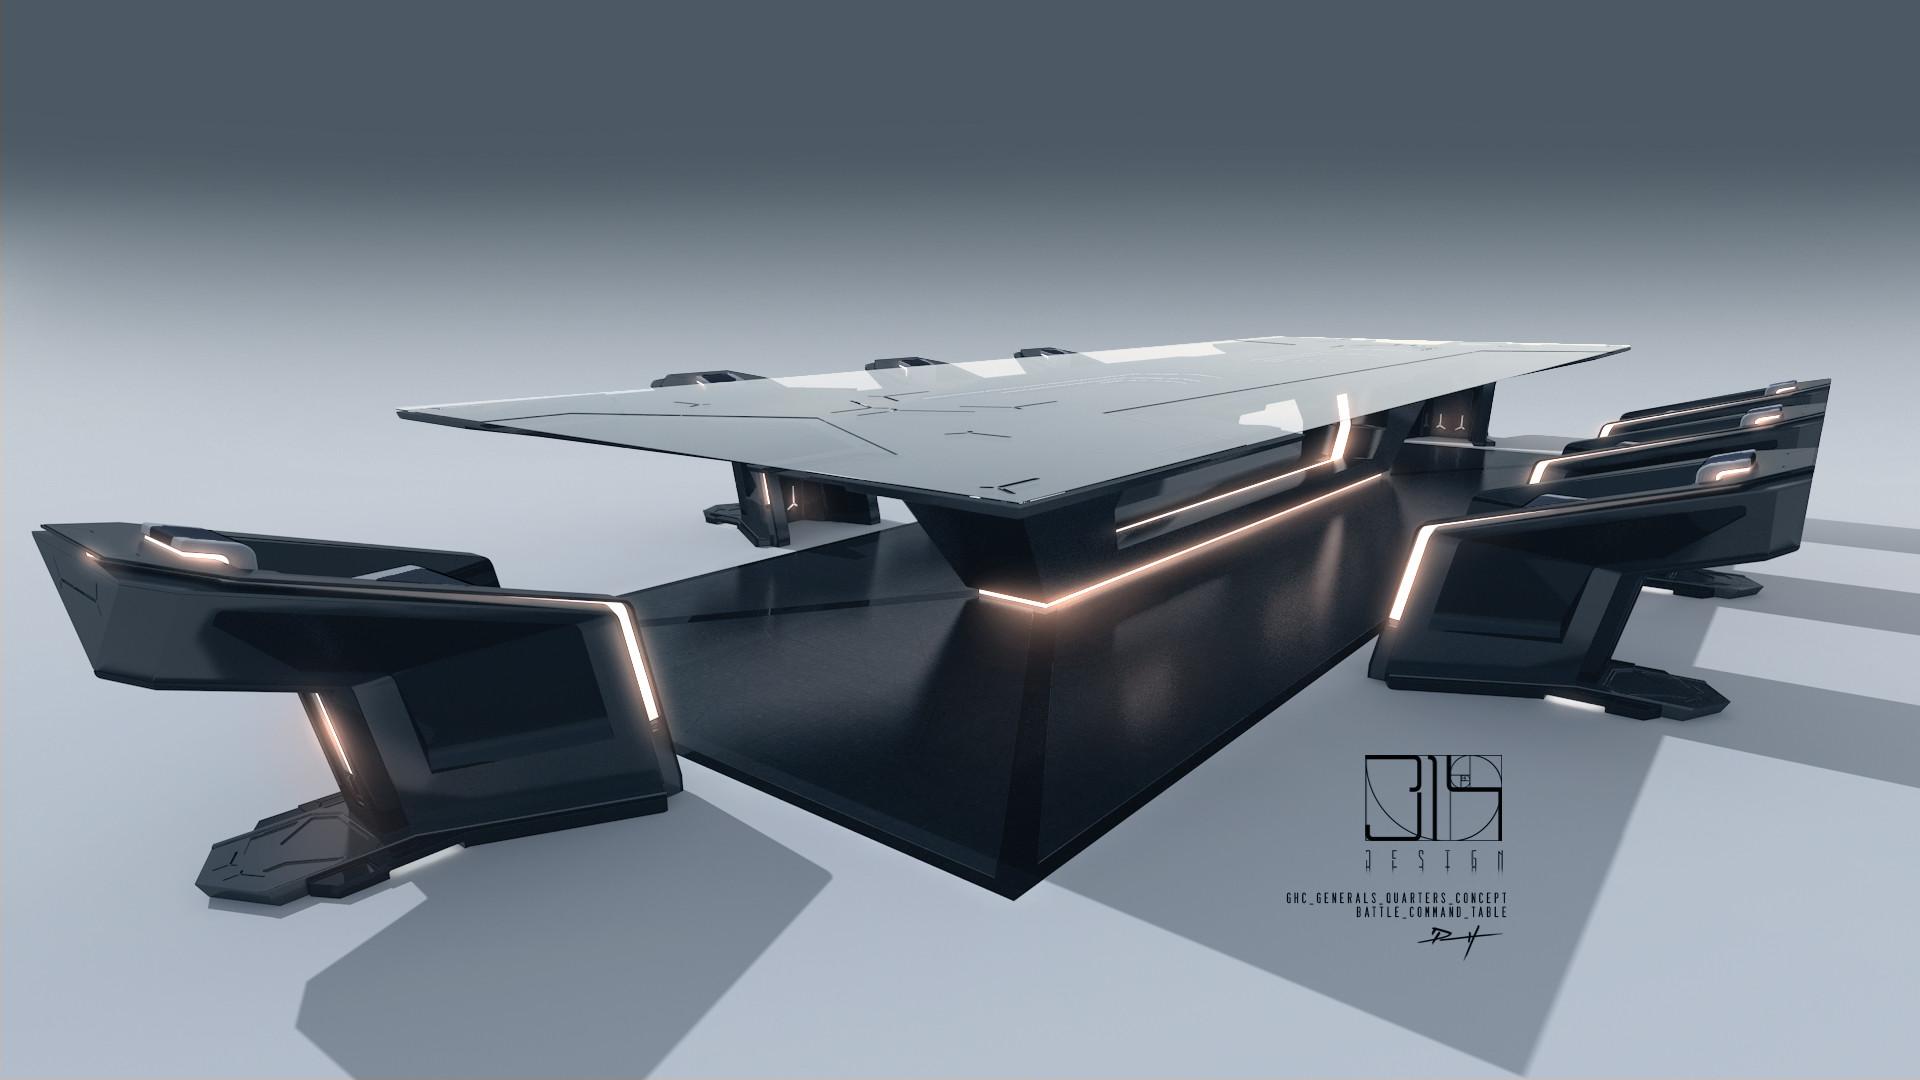 Daniel pellow sci fi room table 02 overpaint 01